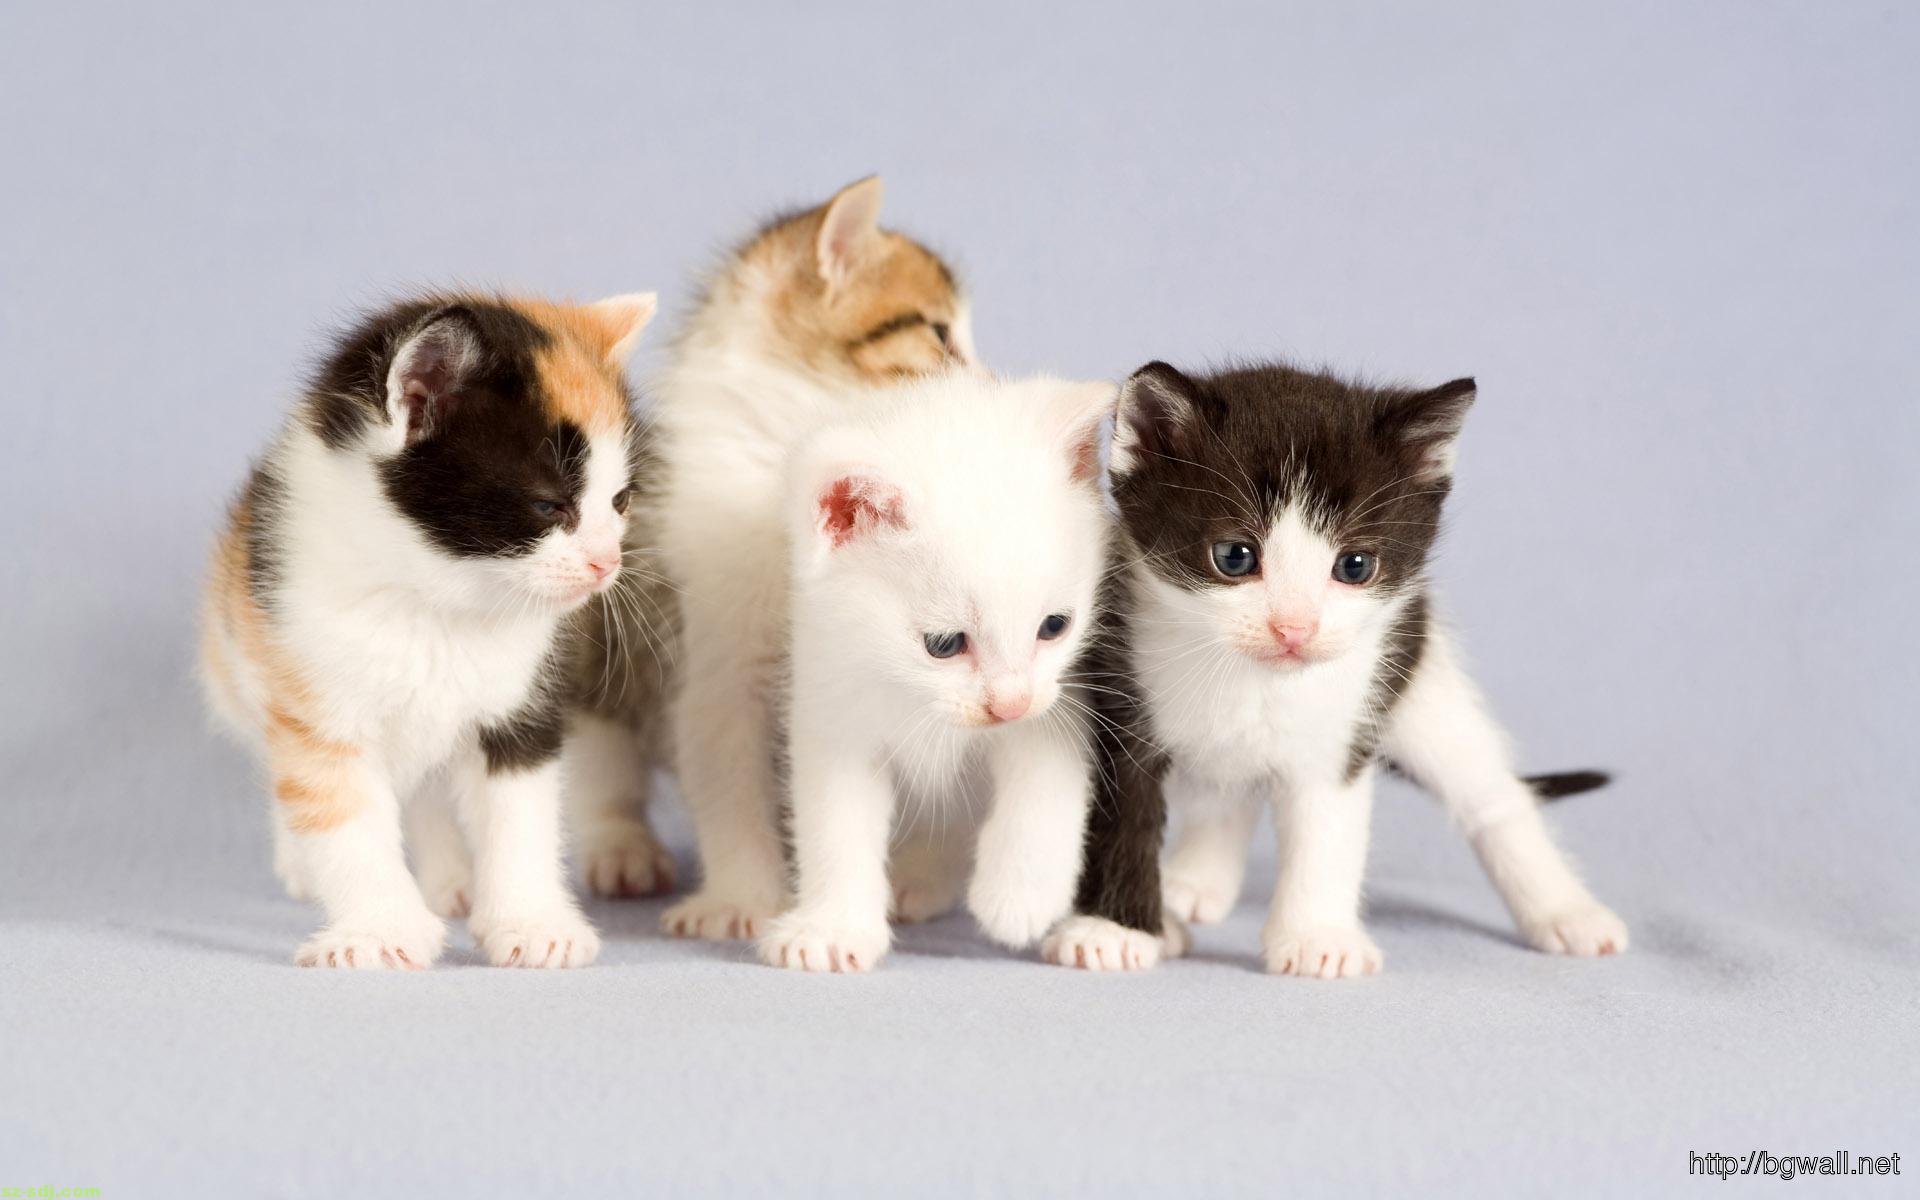 Cute cats desktop wallpaper hd background wallpaper hd - Cute kitten backgrounds for desktop ...